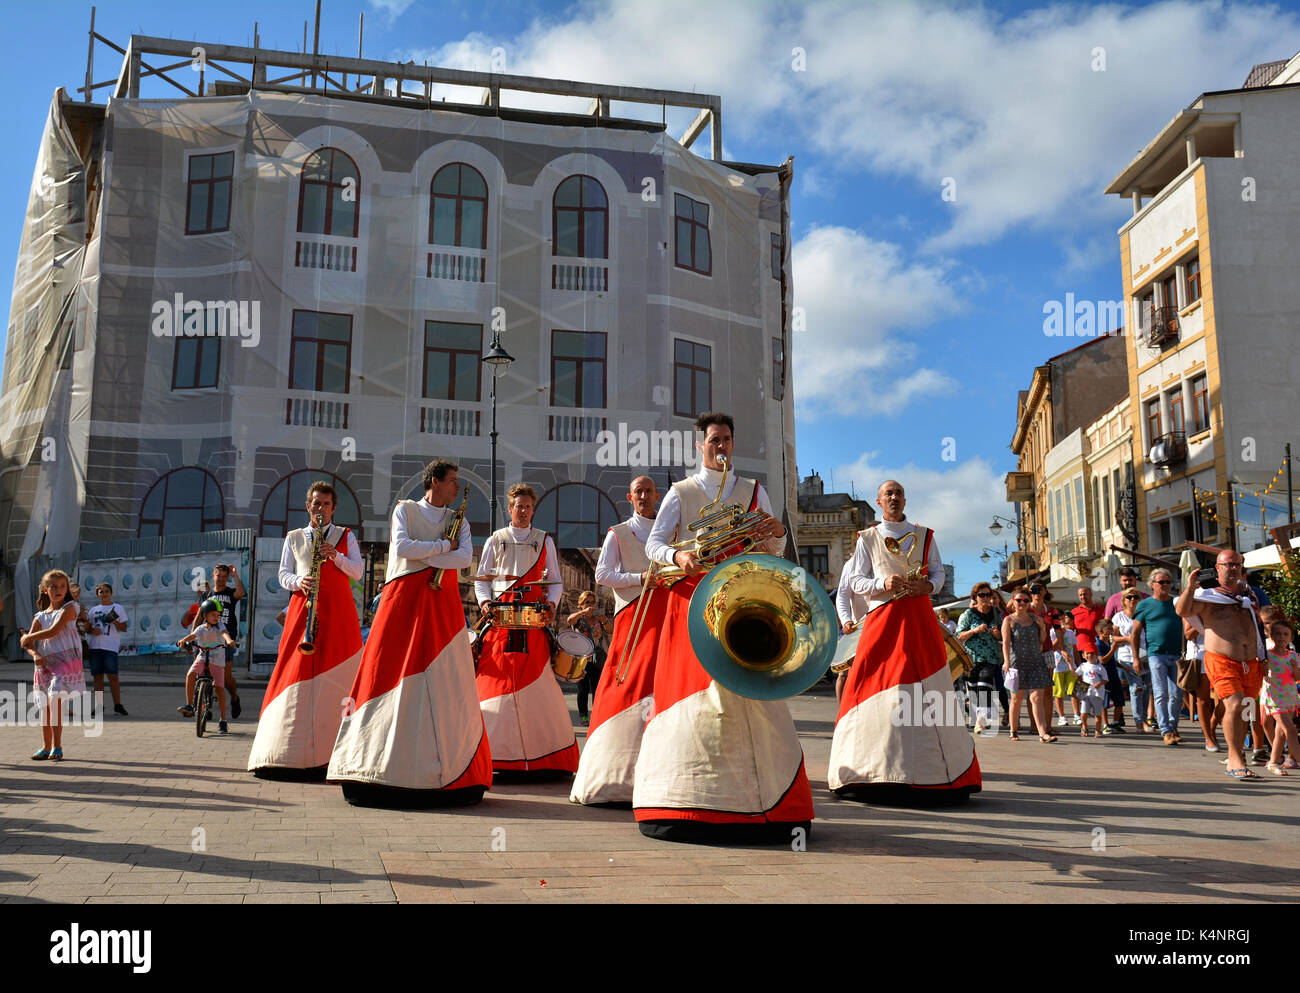 CONSTANTA, ROMANIA - SEPTEMBER 3, 2017. ULIK & LE SNOB & Cie  from France at International Street Festival 'Art District ' at Ovidius Square Constanta - Stock Image